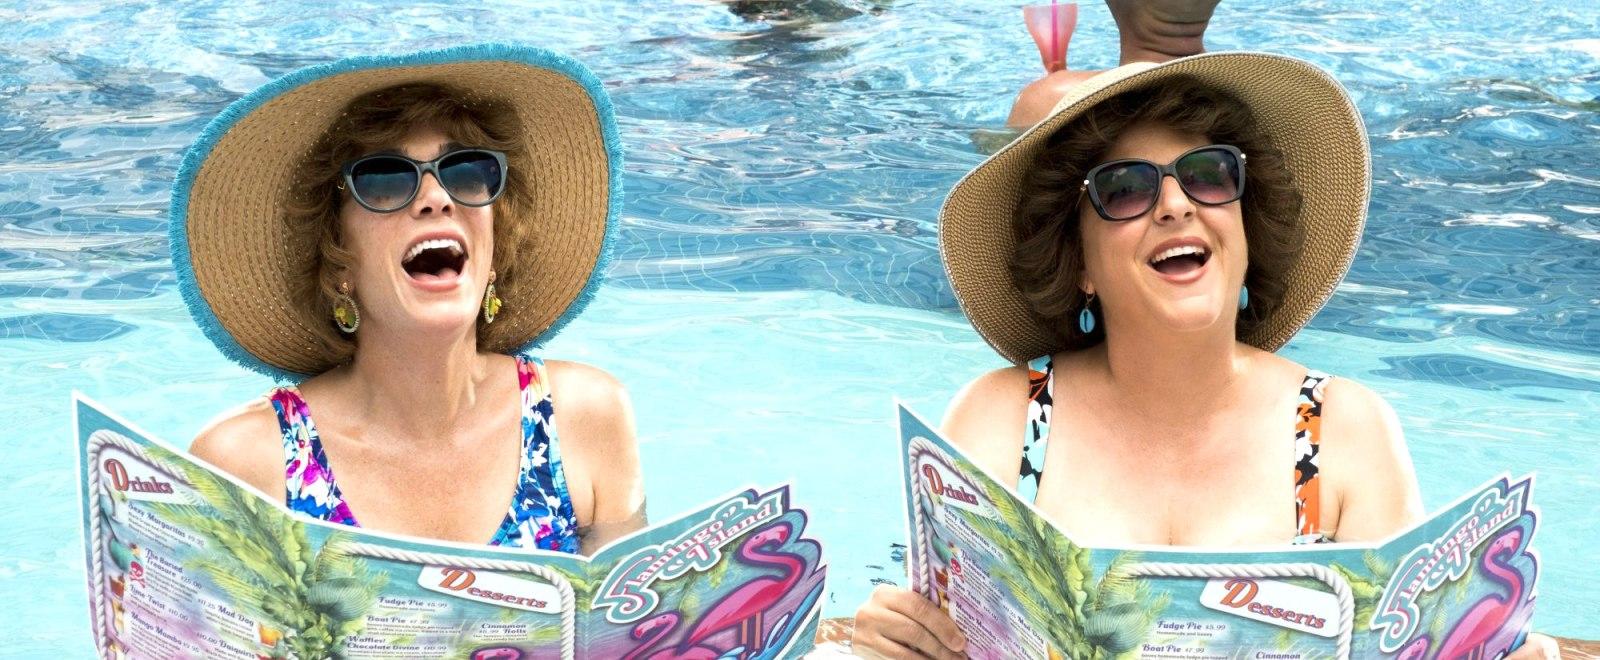 Barb (Annie Mumolo) And Star (Kristen Wiig) Will Go To Disney To Write A 'Cinderella's Evil Stepsisters' Movie